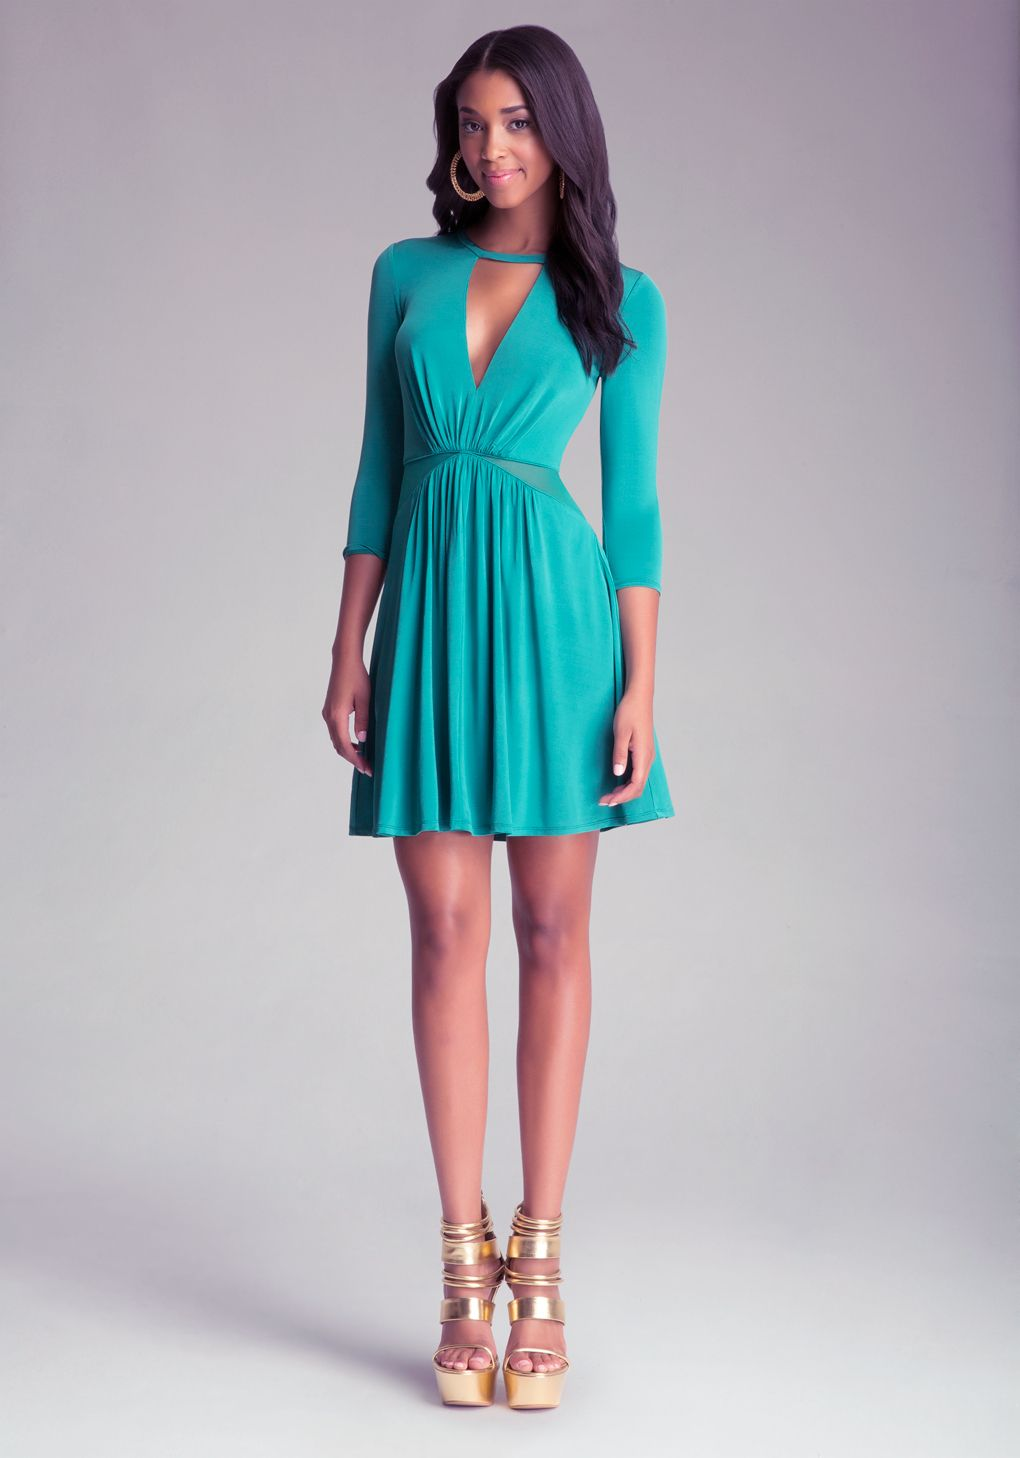 Bebe Insetwaist Dress in Blue | Lyst | Dresses | Pinterest | Bebe